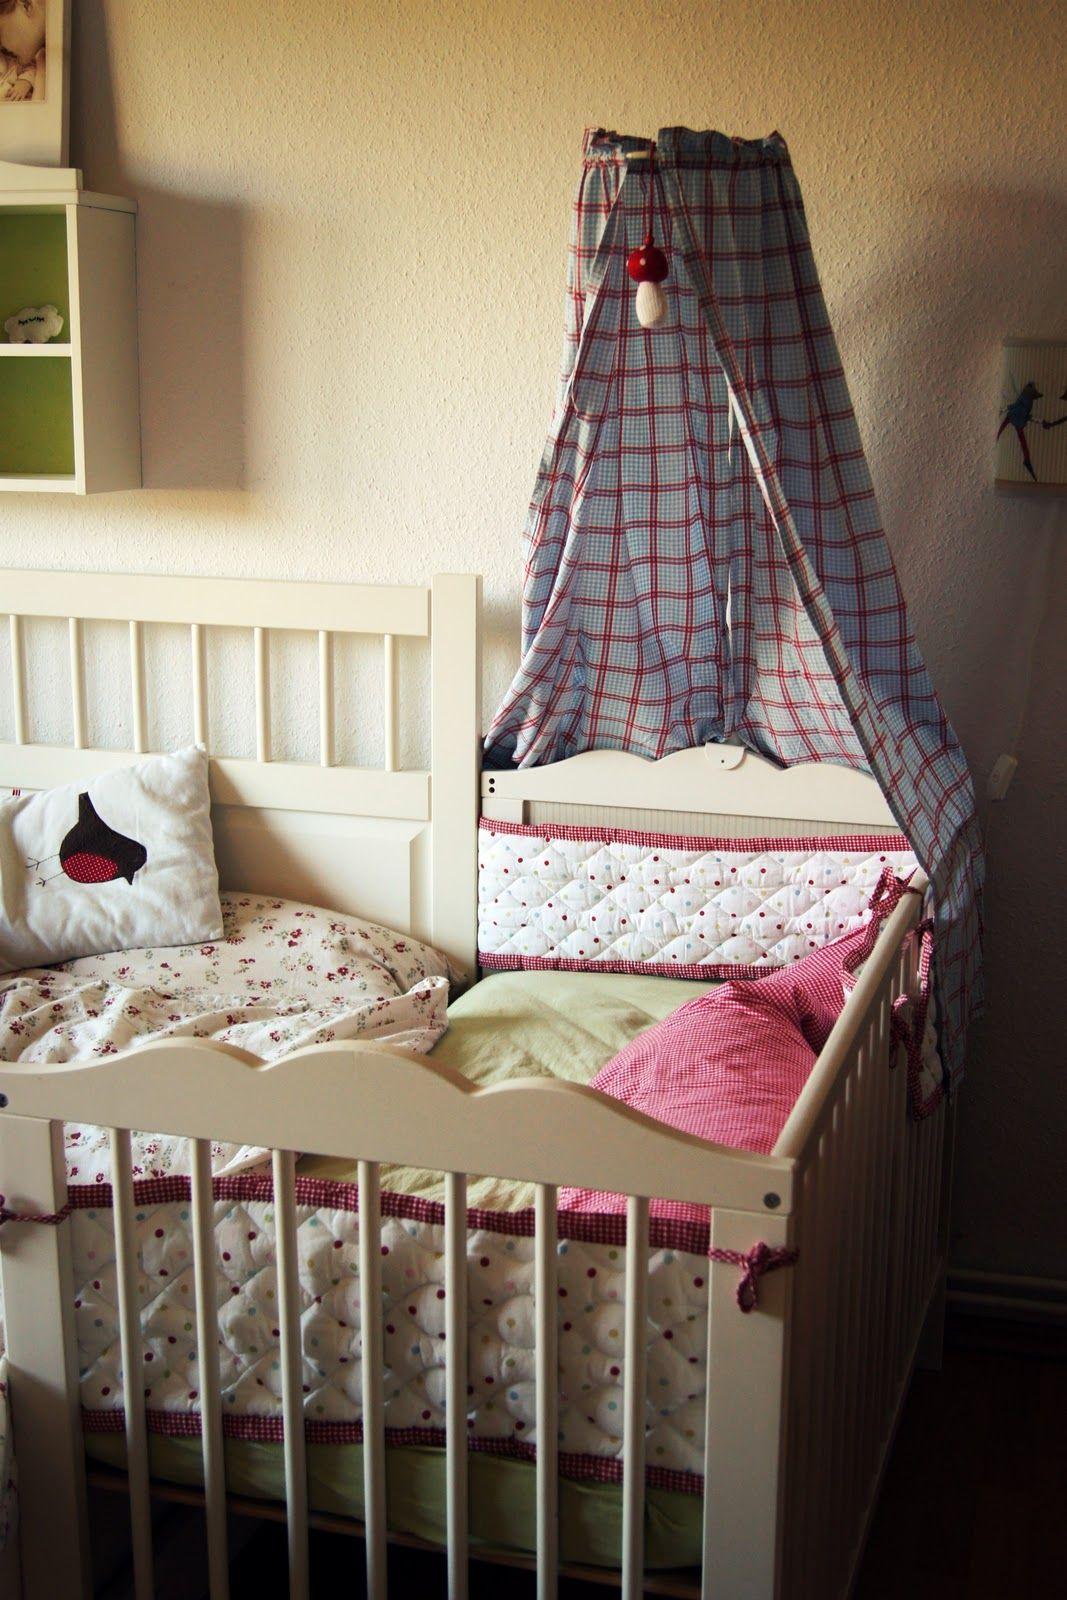 Der Nestbautrieb Beistellbett Babybett Ikea Babybett